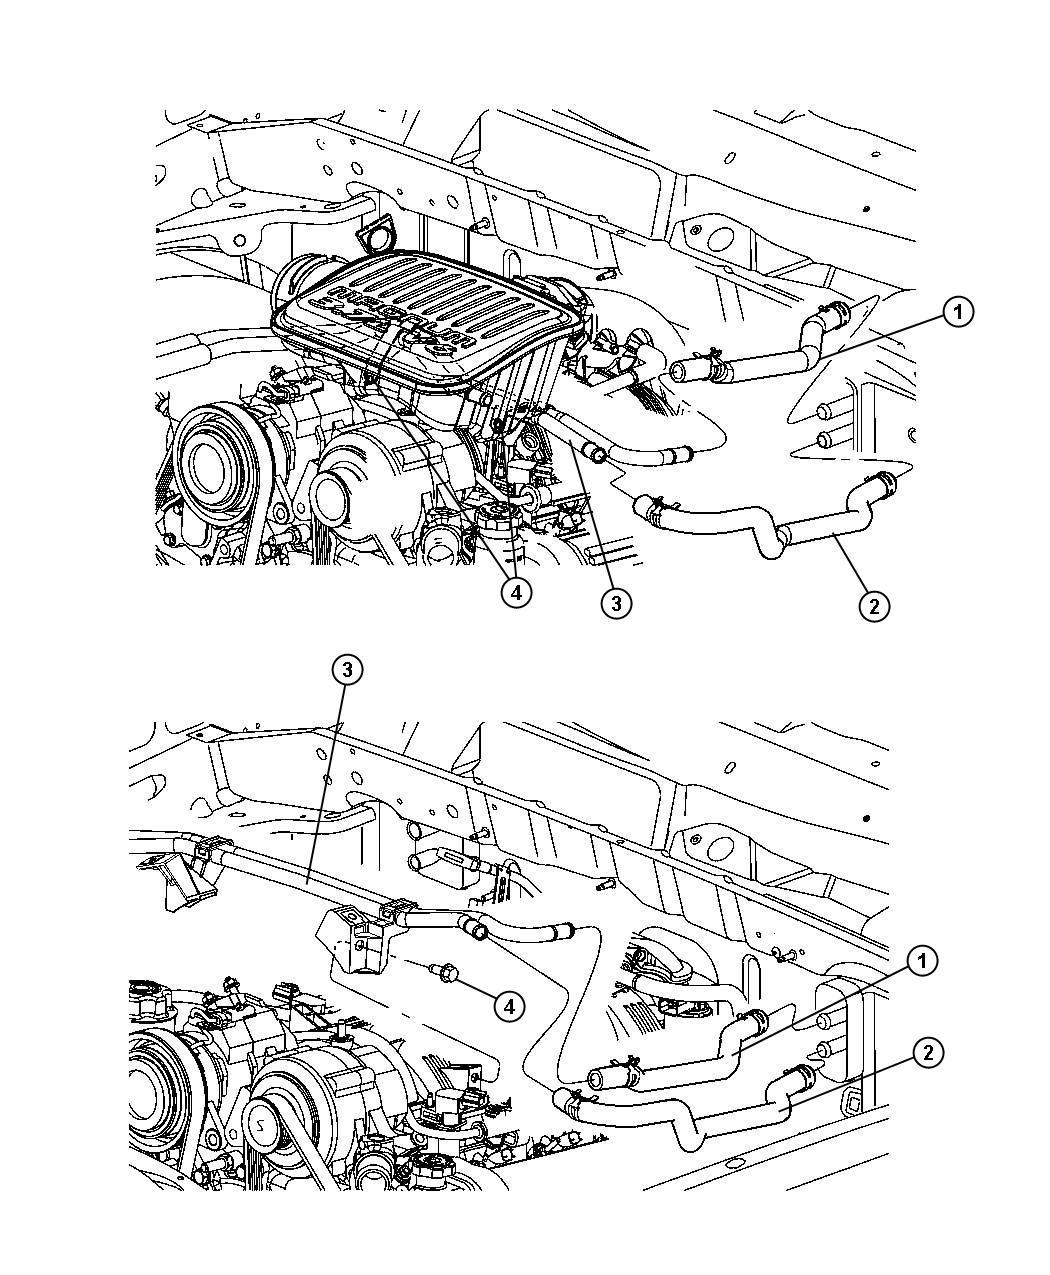 Dodge Dakota Used for: HOSE AND TUBE. Used for: Heater